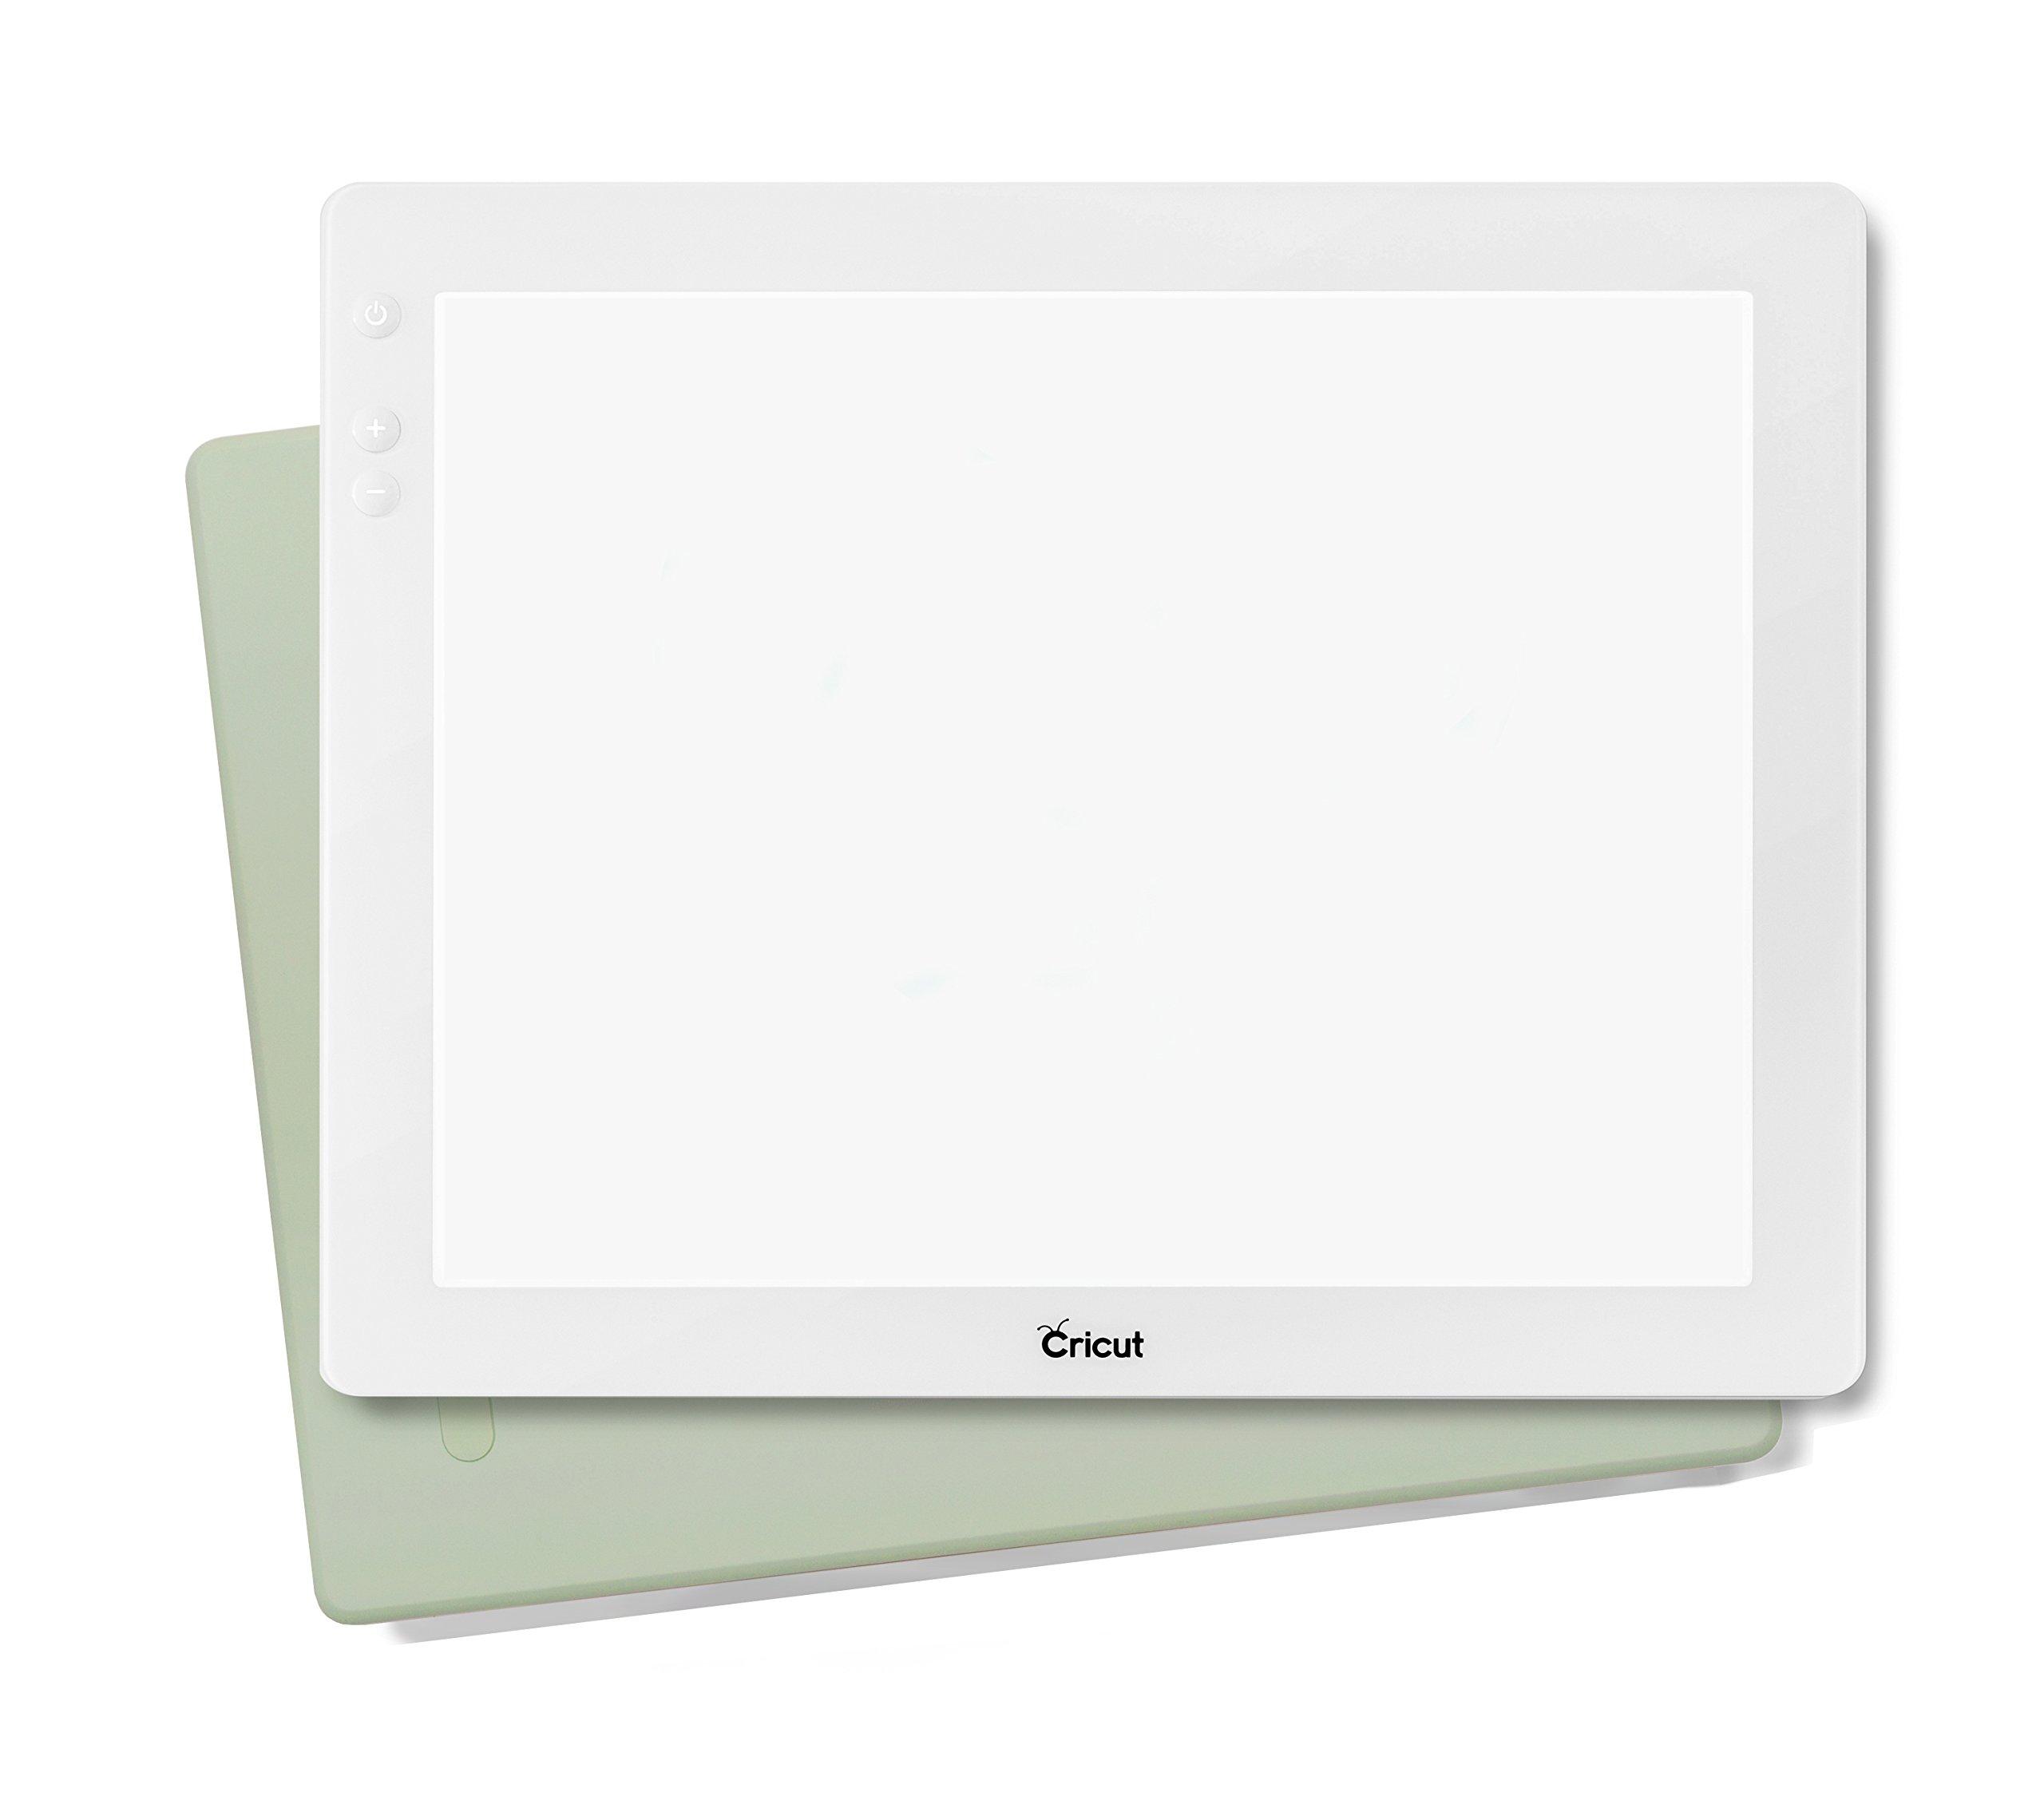 Cricut  Bright Pad - Mint by Cricut